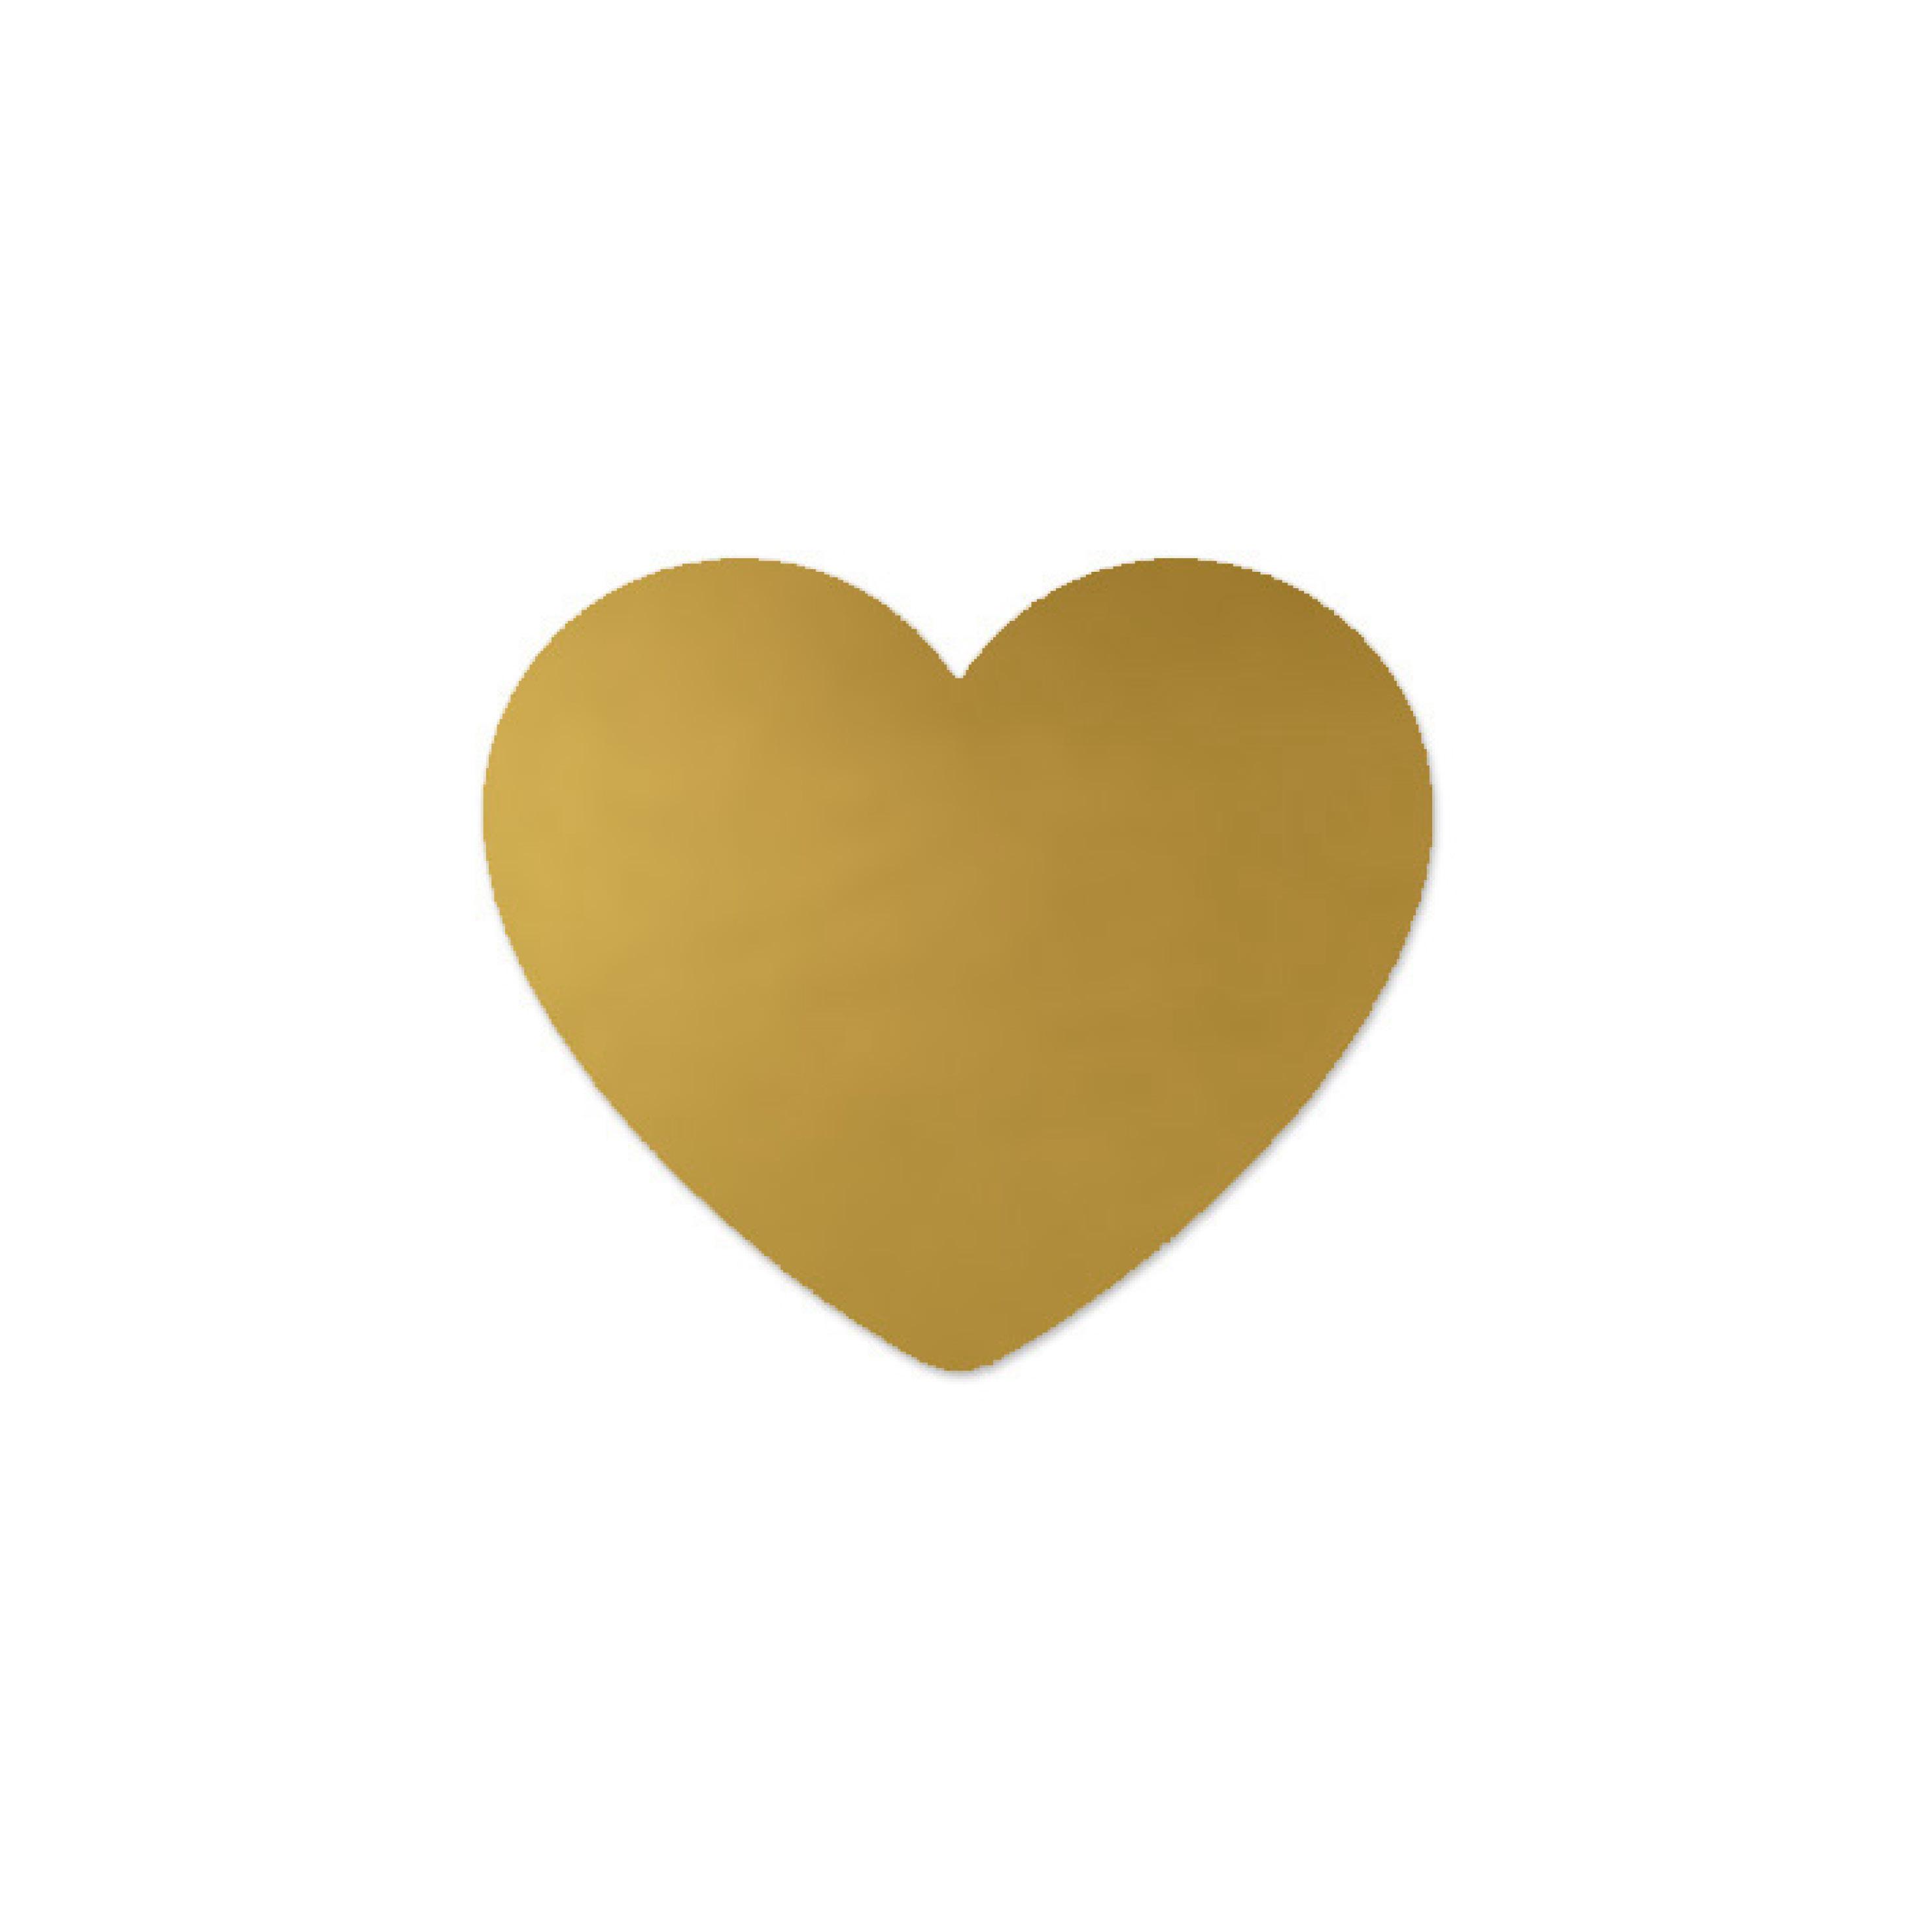 Hart goud - 2